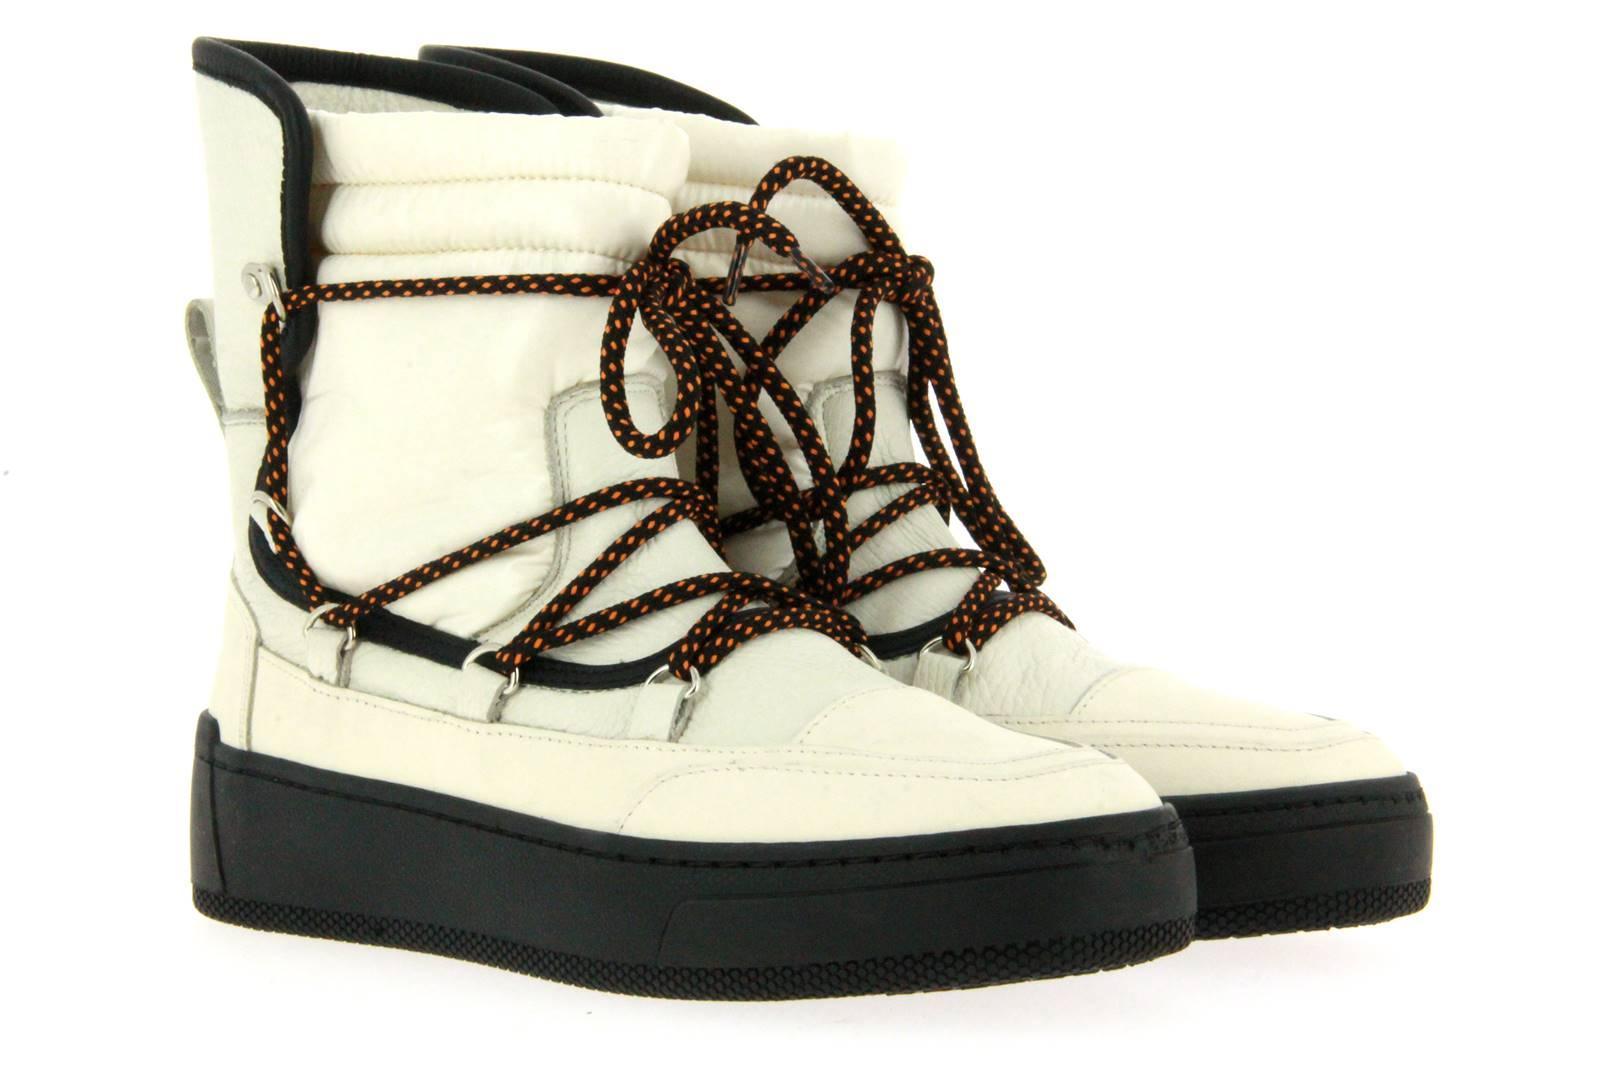 Candice Cooper Boots ALASKA.F NYLON BIANCO (38)